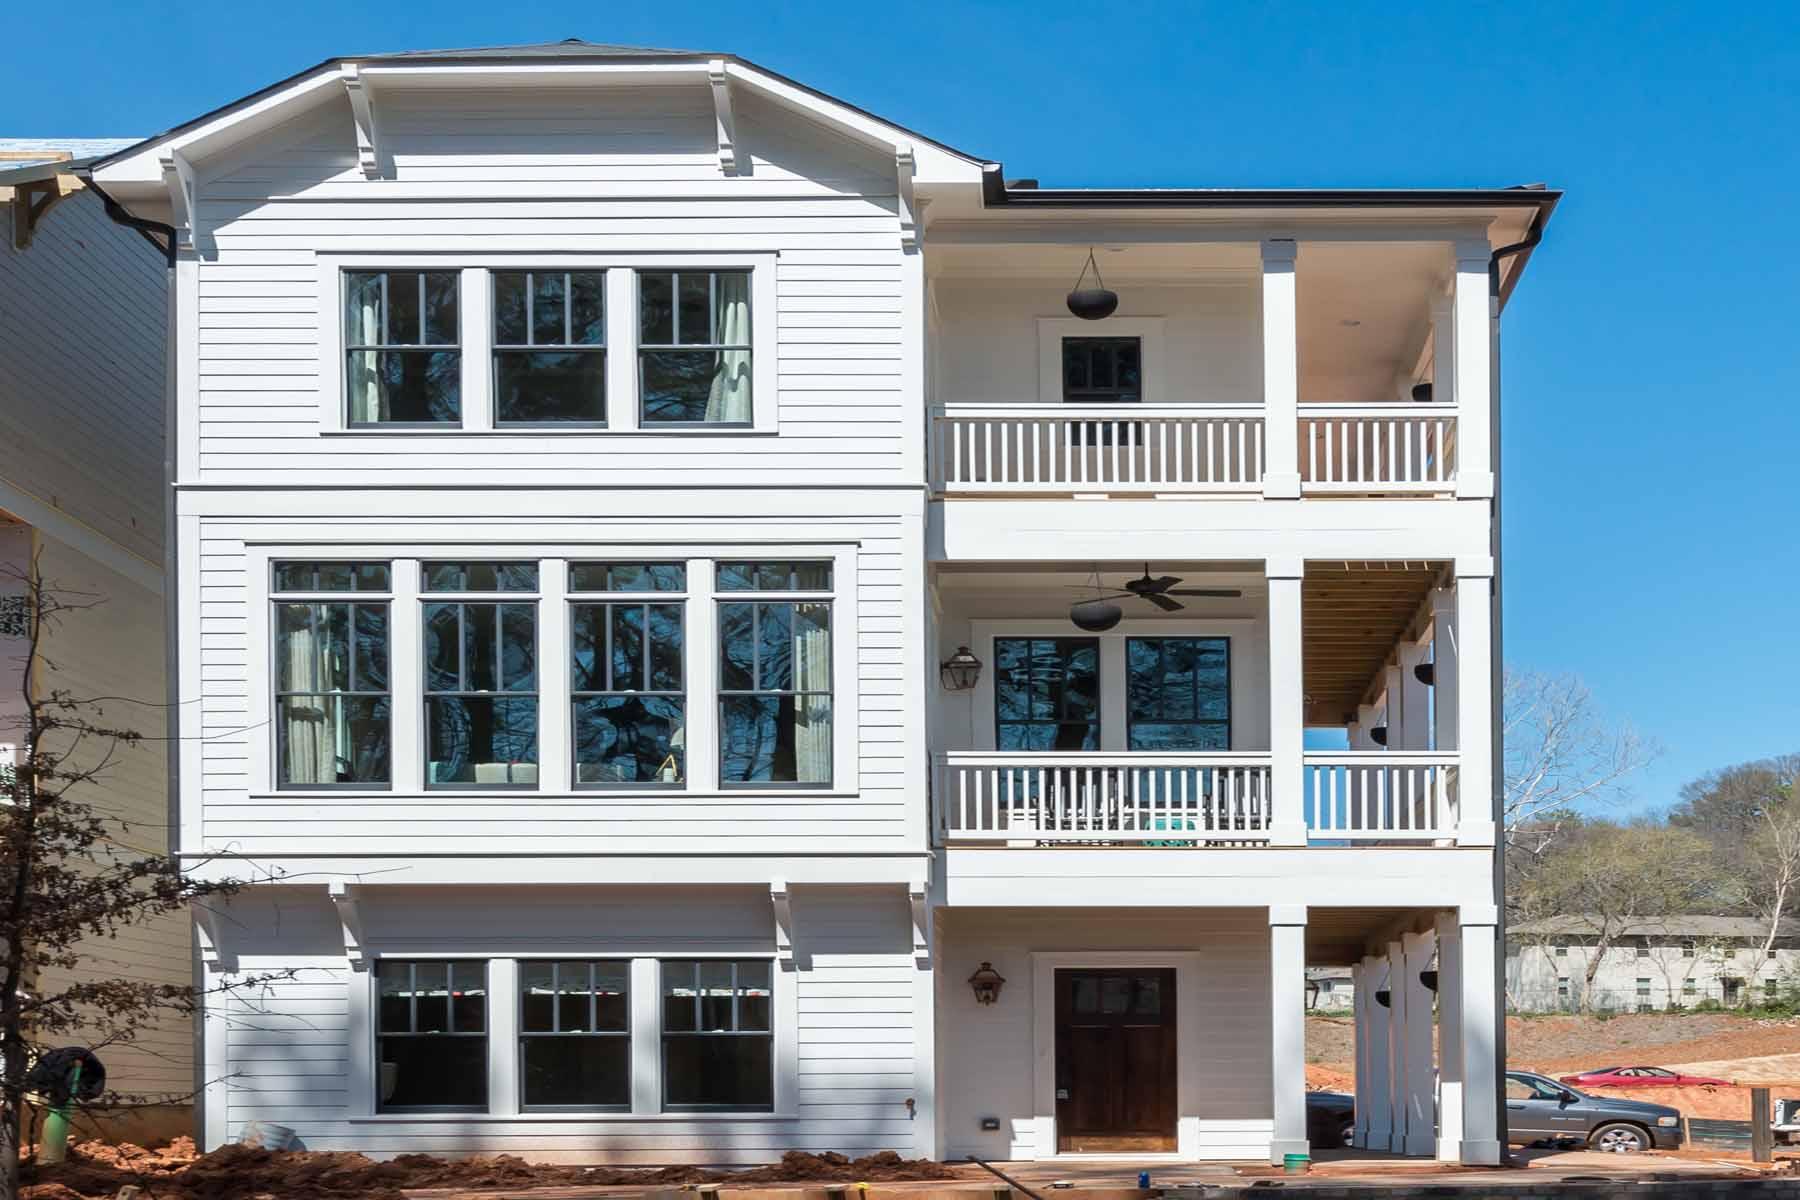 Single Family Home for Sale at Gorgeous Decatur Cottage 2820 Craigie Avenue Unit 4 Decatur, Georgia, 30030 United States